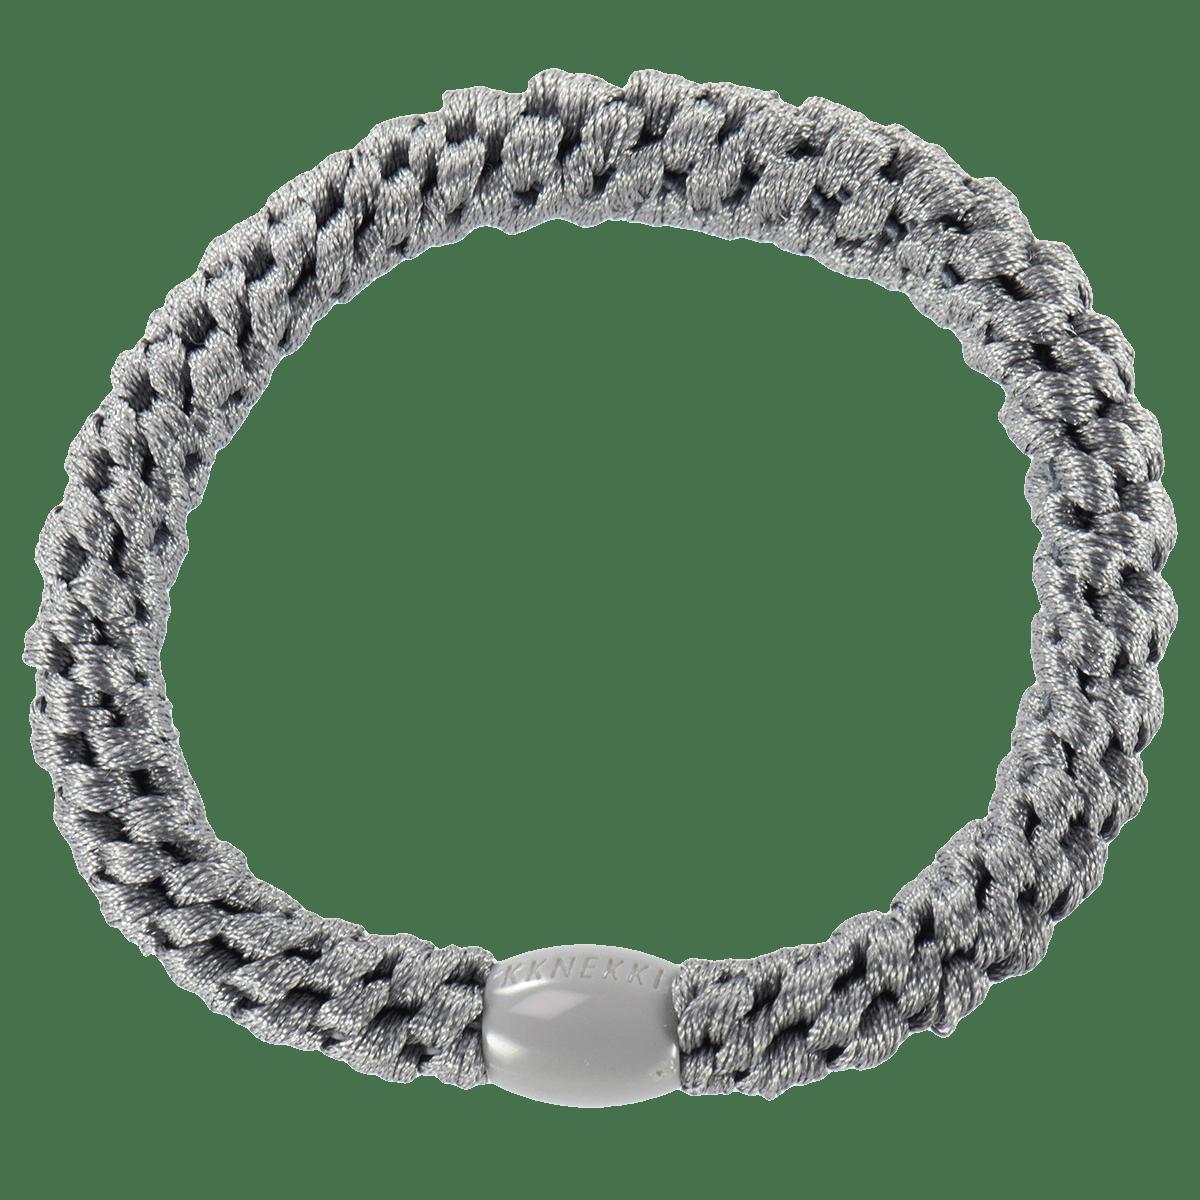 Haargummi / Armband - Mid grey 1636 - KKNEKKI